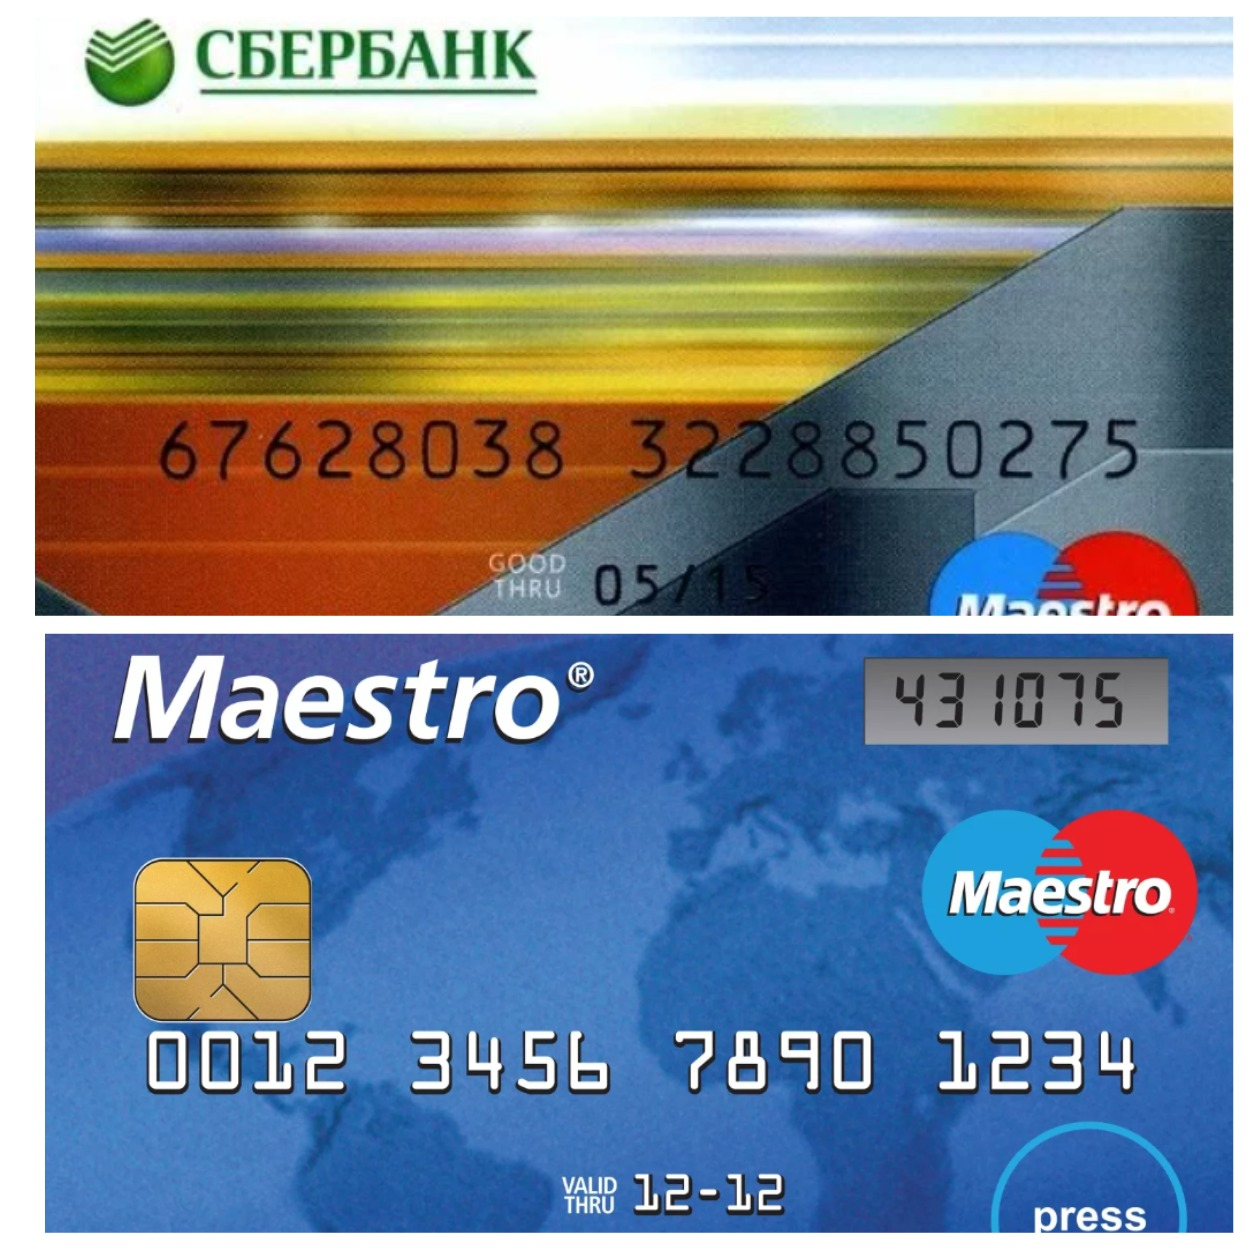 Номер карты Маэстро Сбербанка